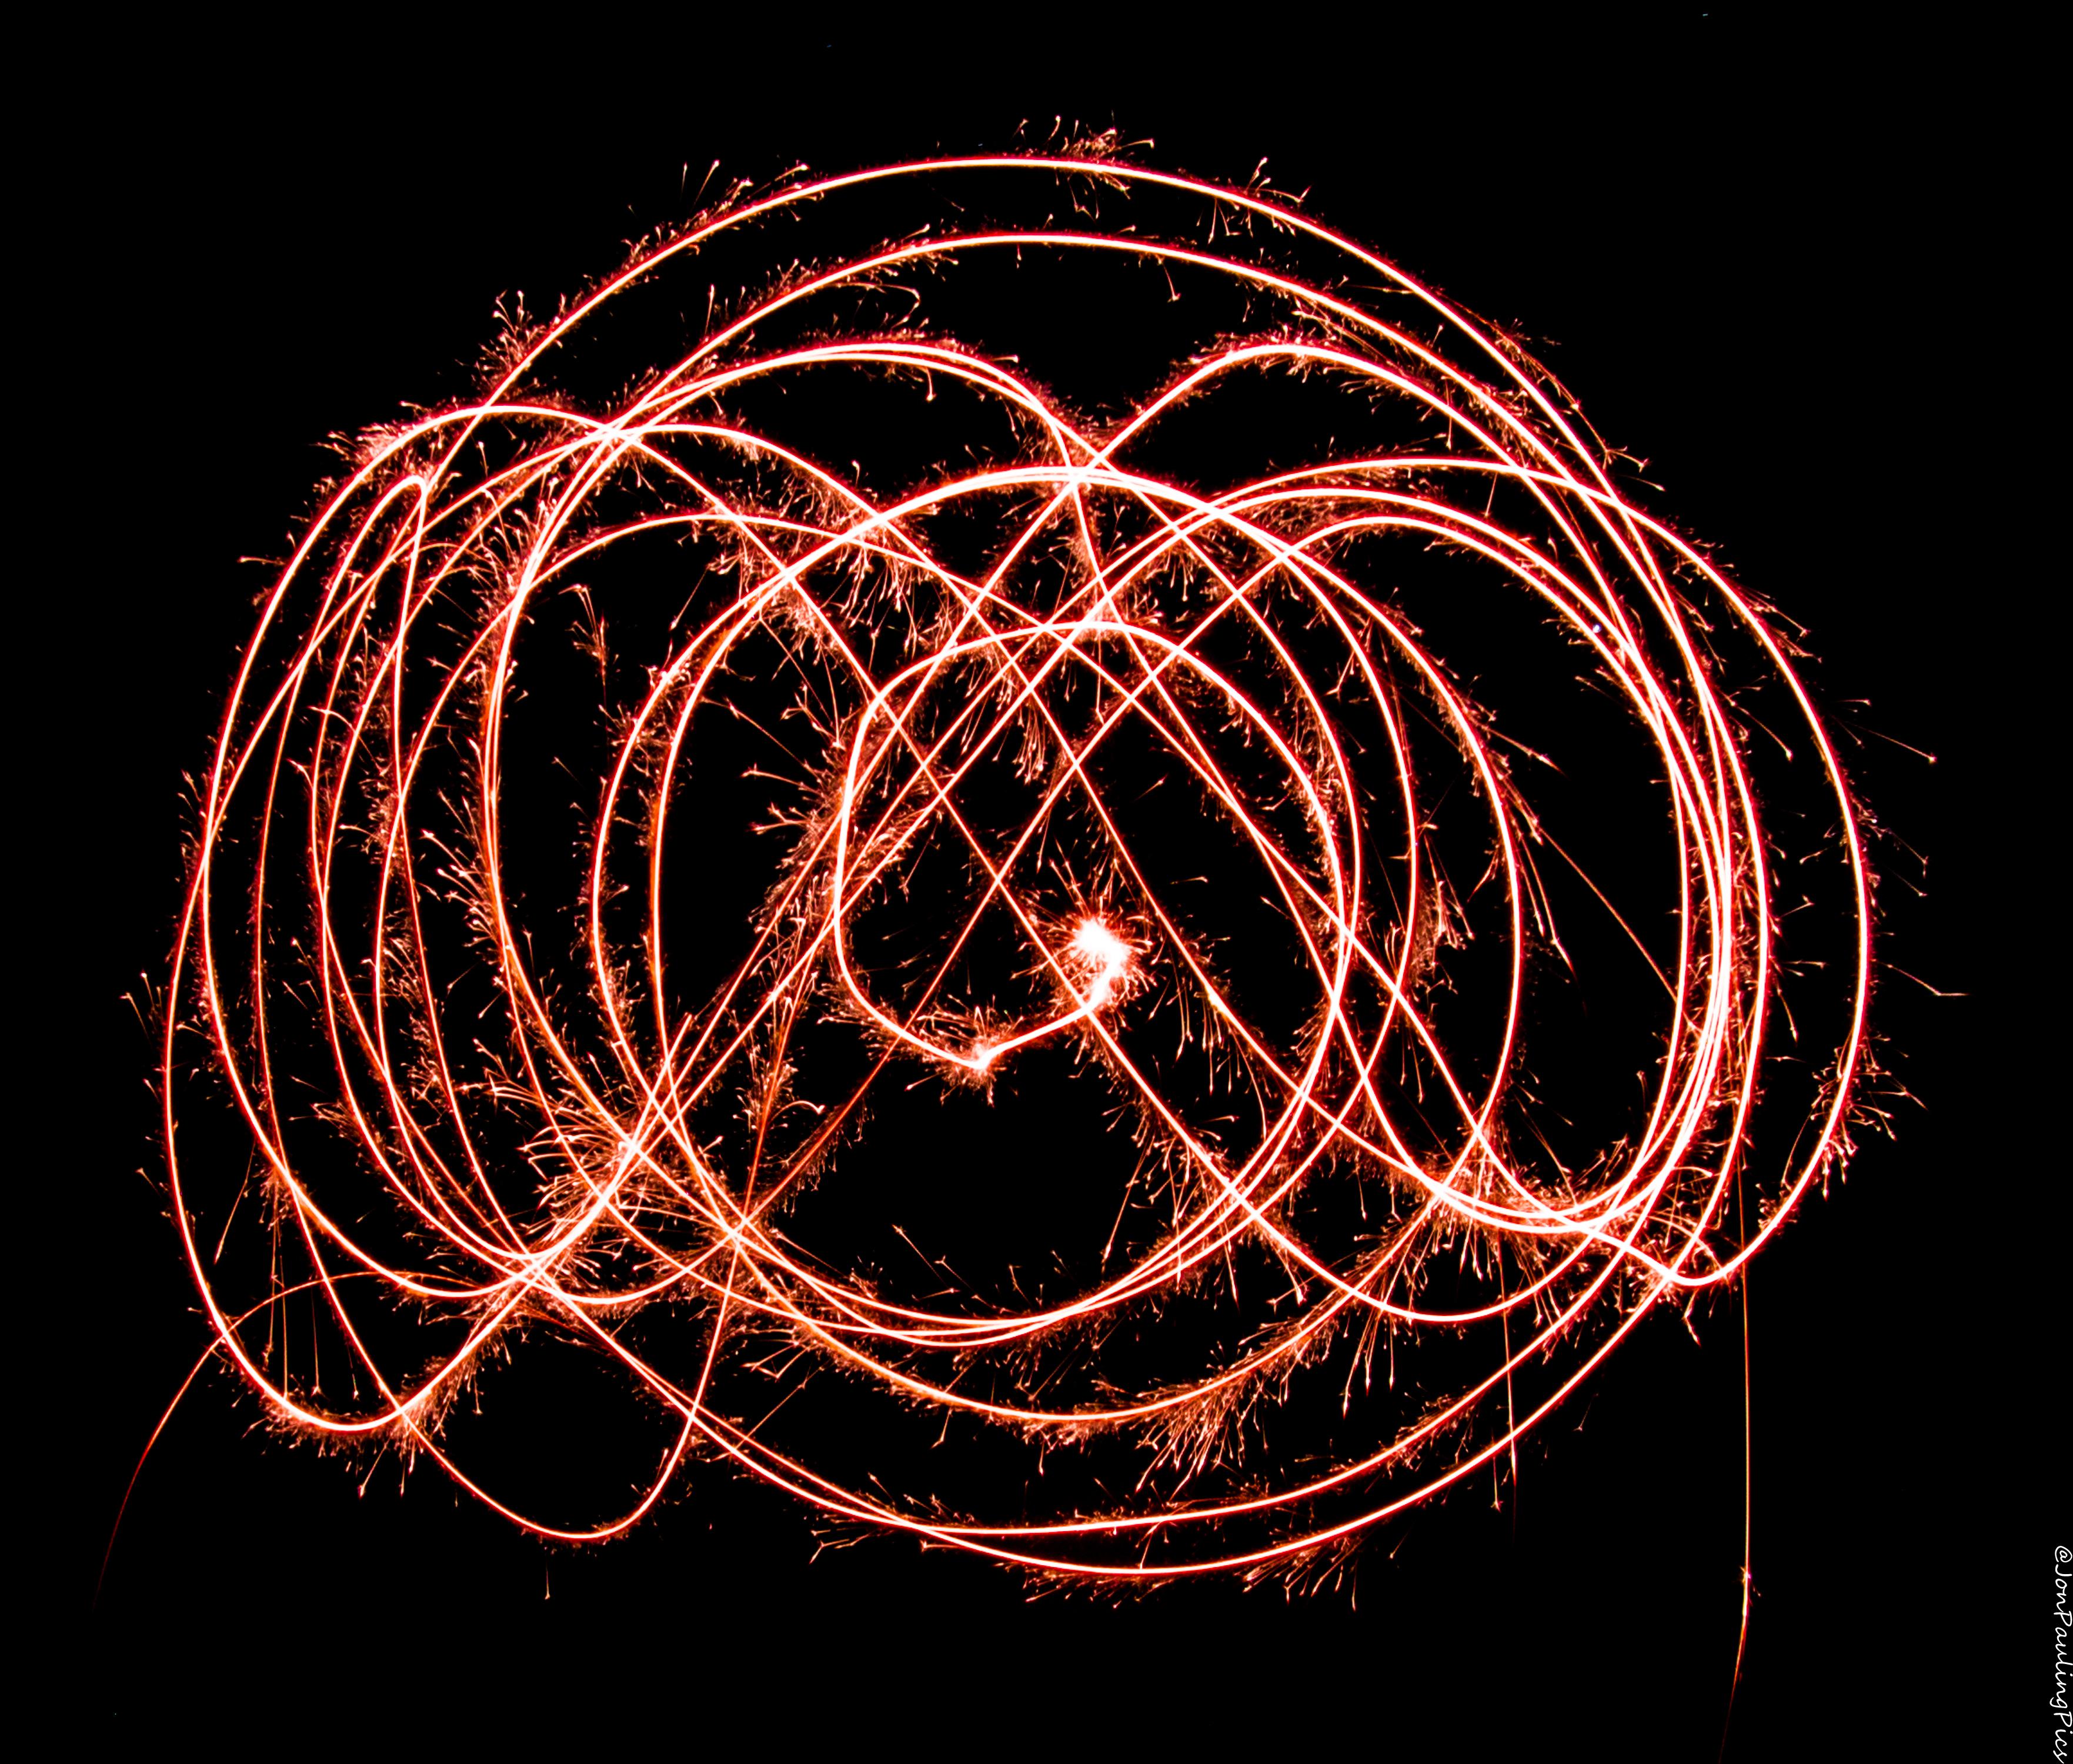 Sparkley by Mincingyoda